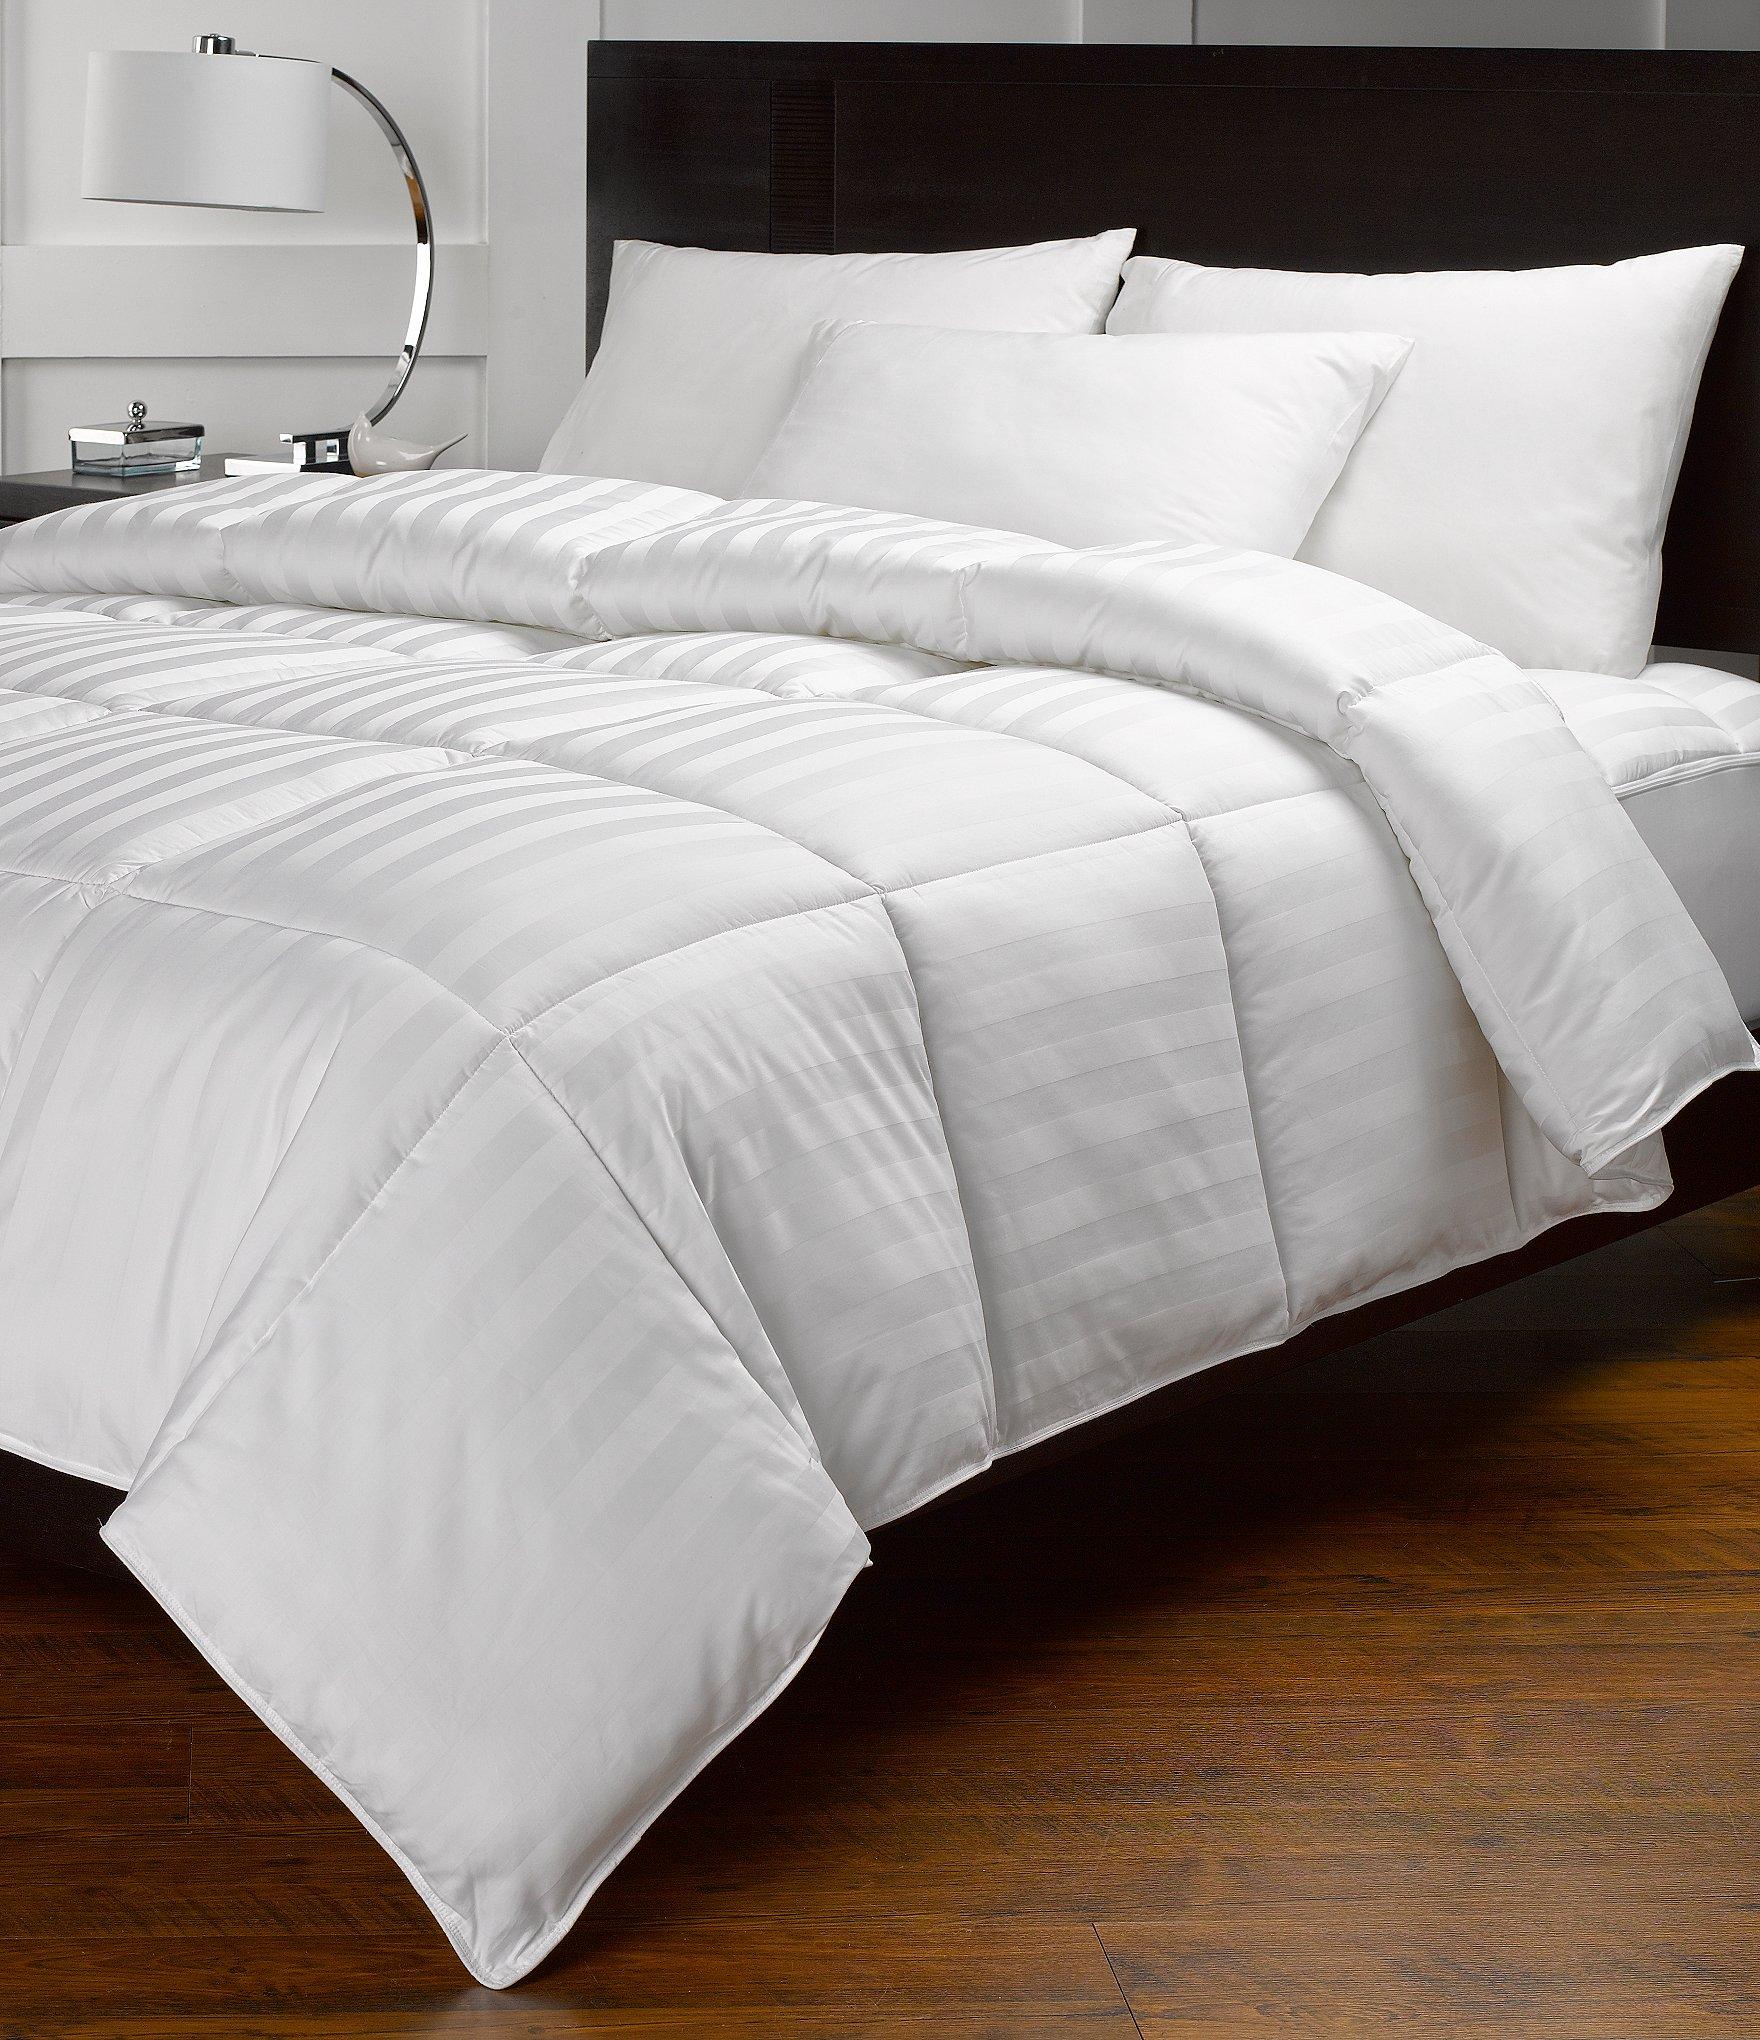 White Comforters Down Comforters Dillard S